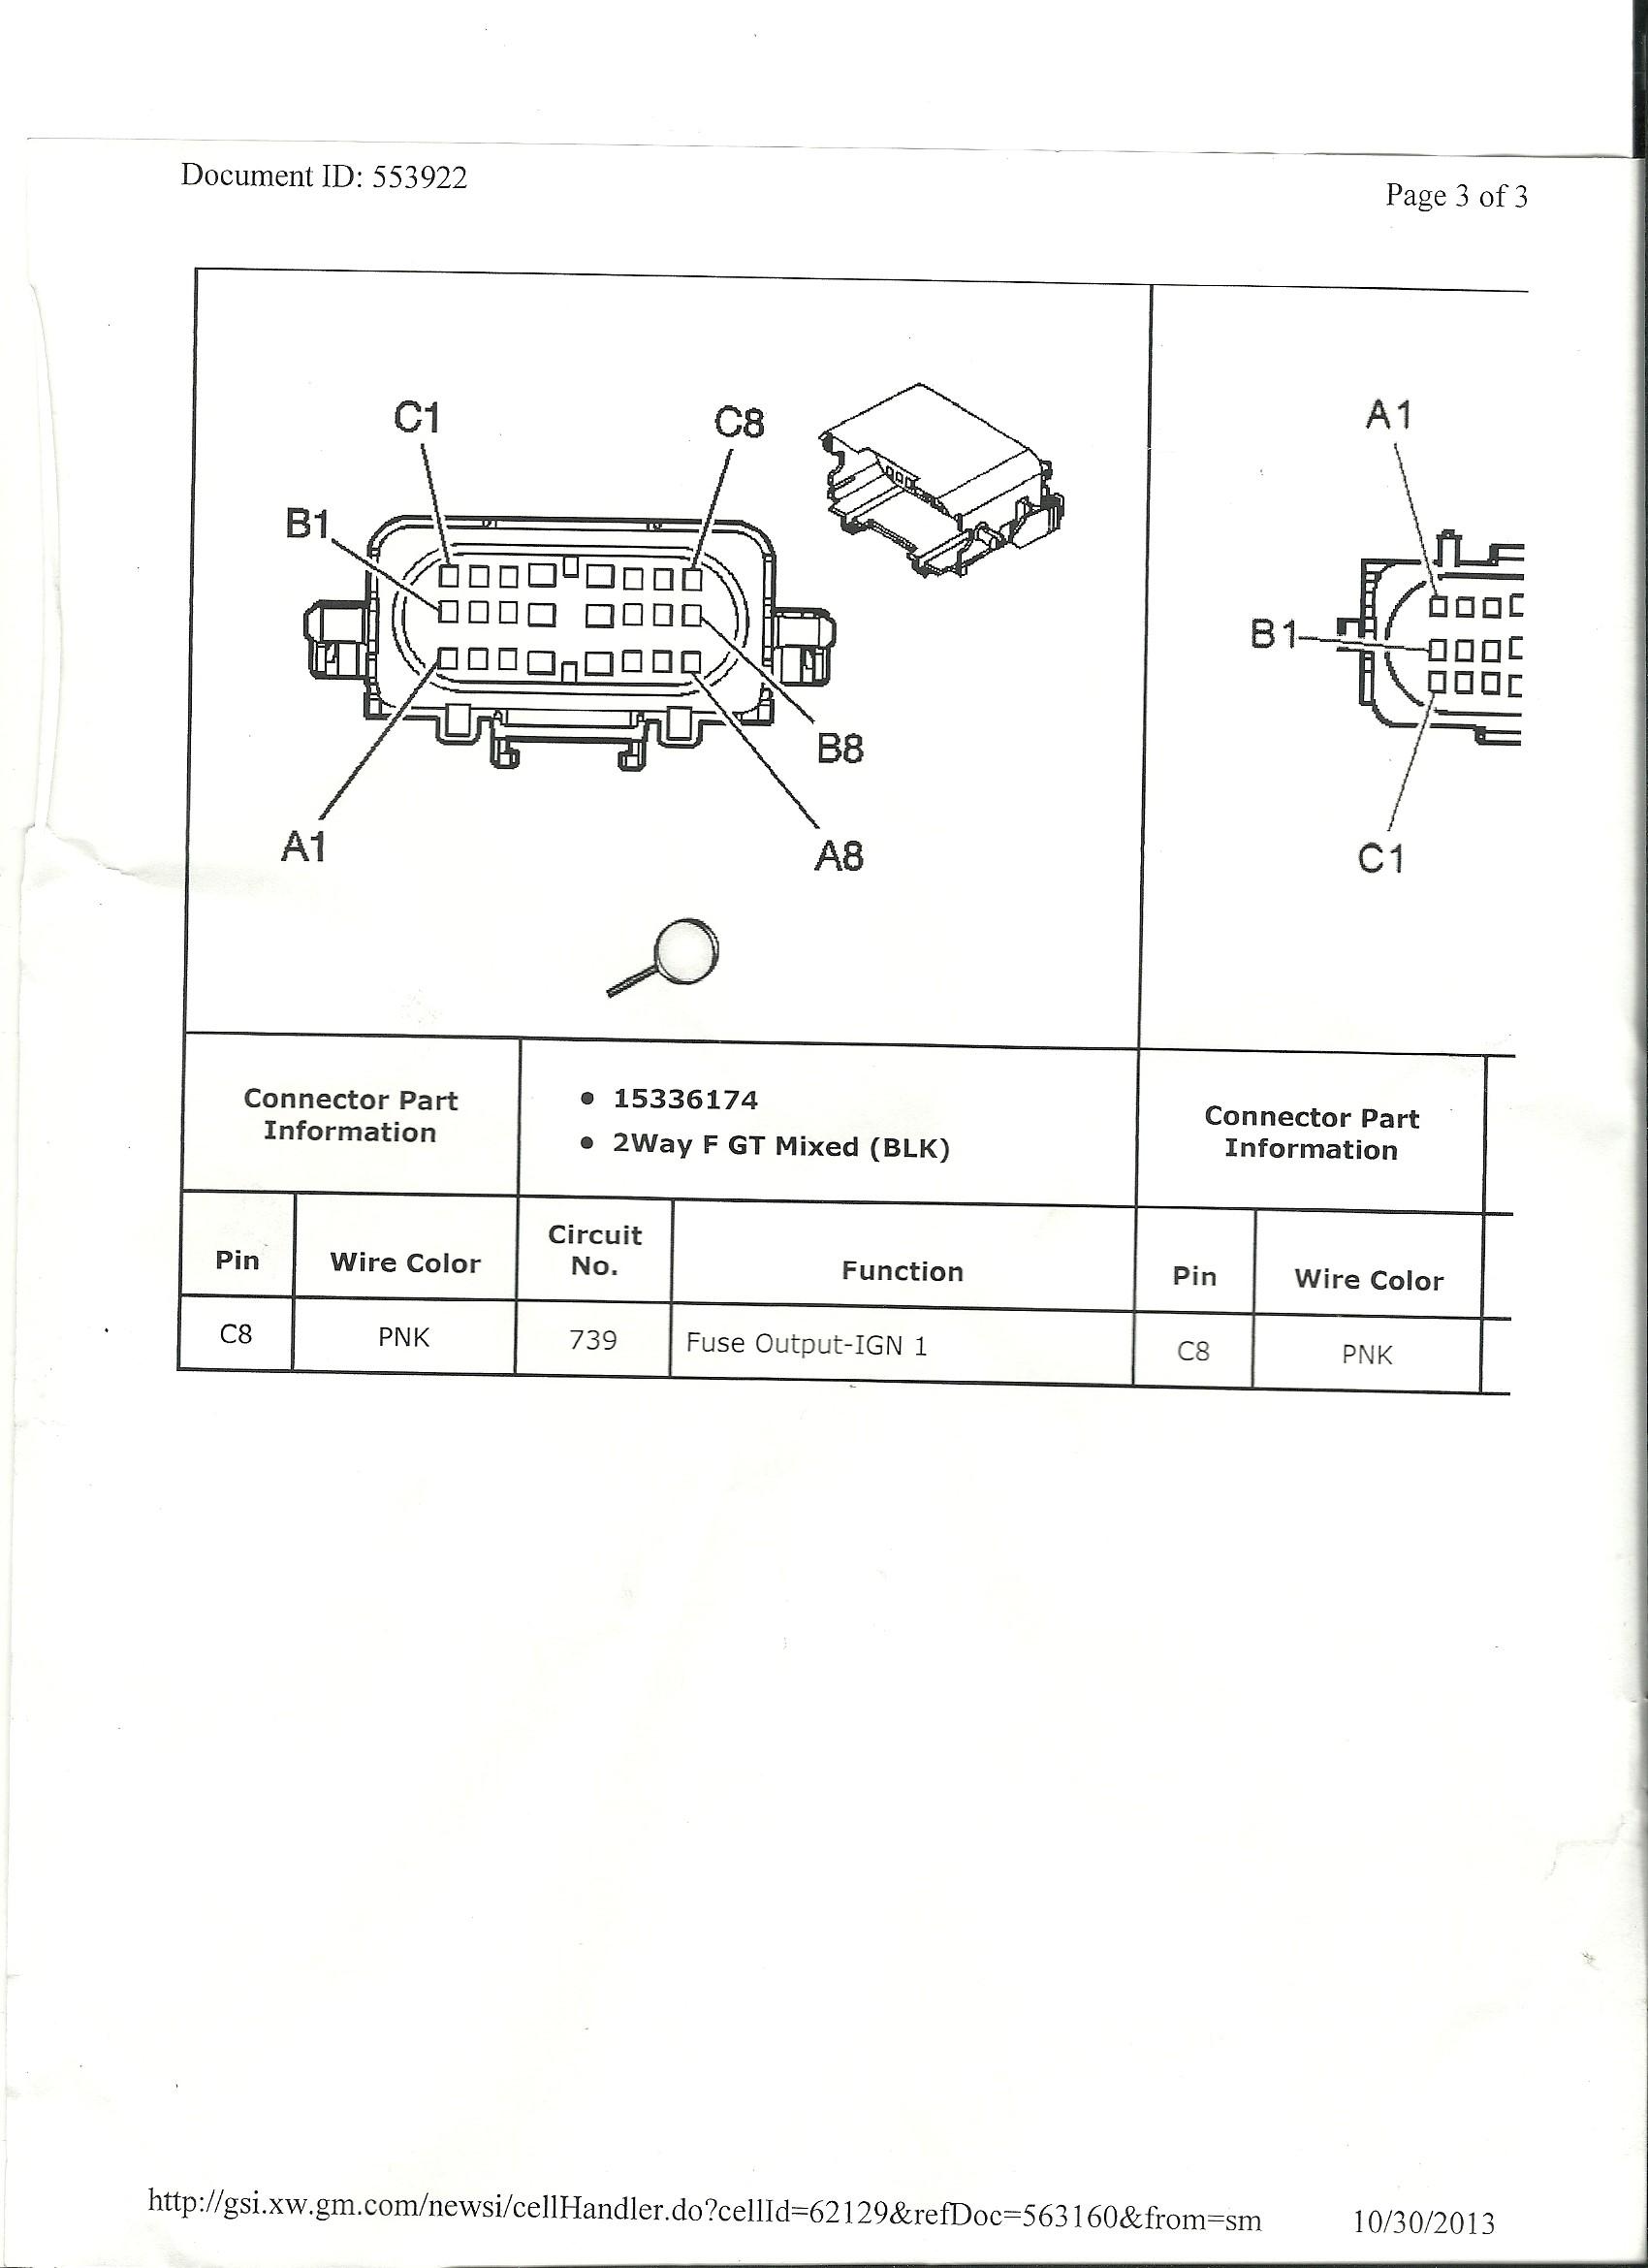 2000 impala wiring diagram wiring diagram00 impala wiring diagram wiring diagram schema 2000